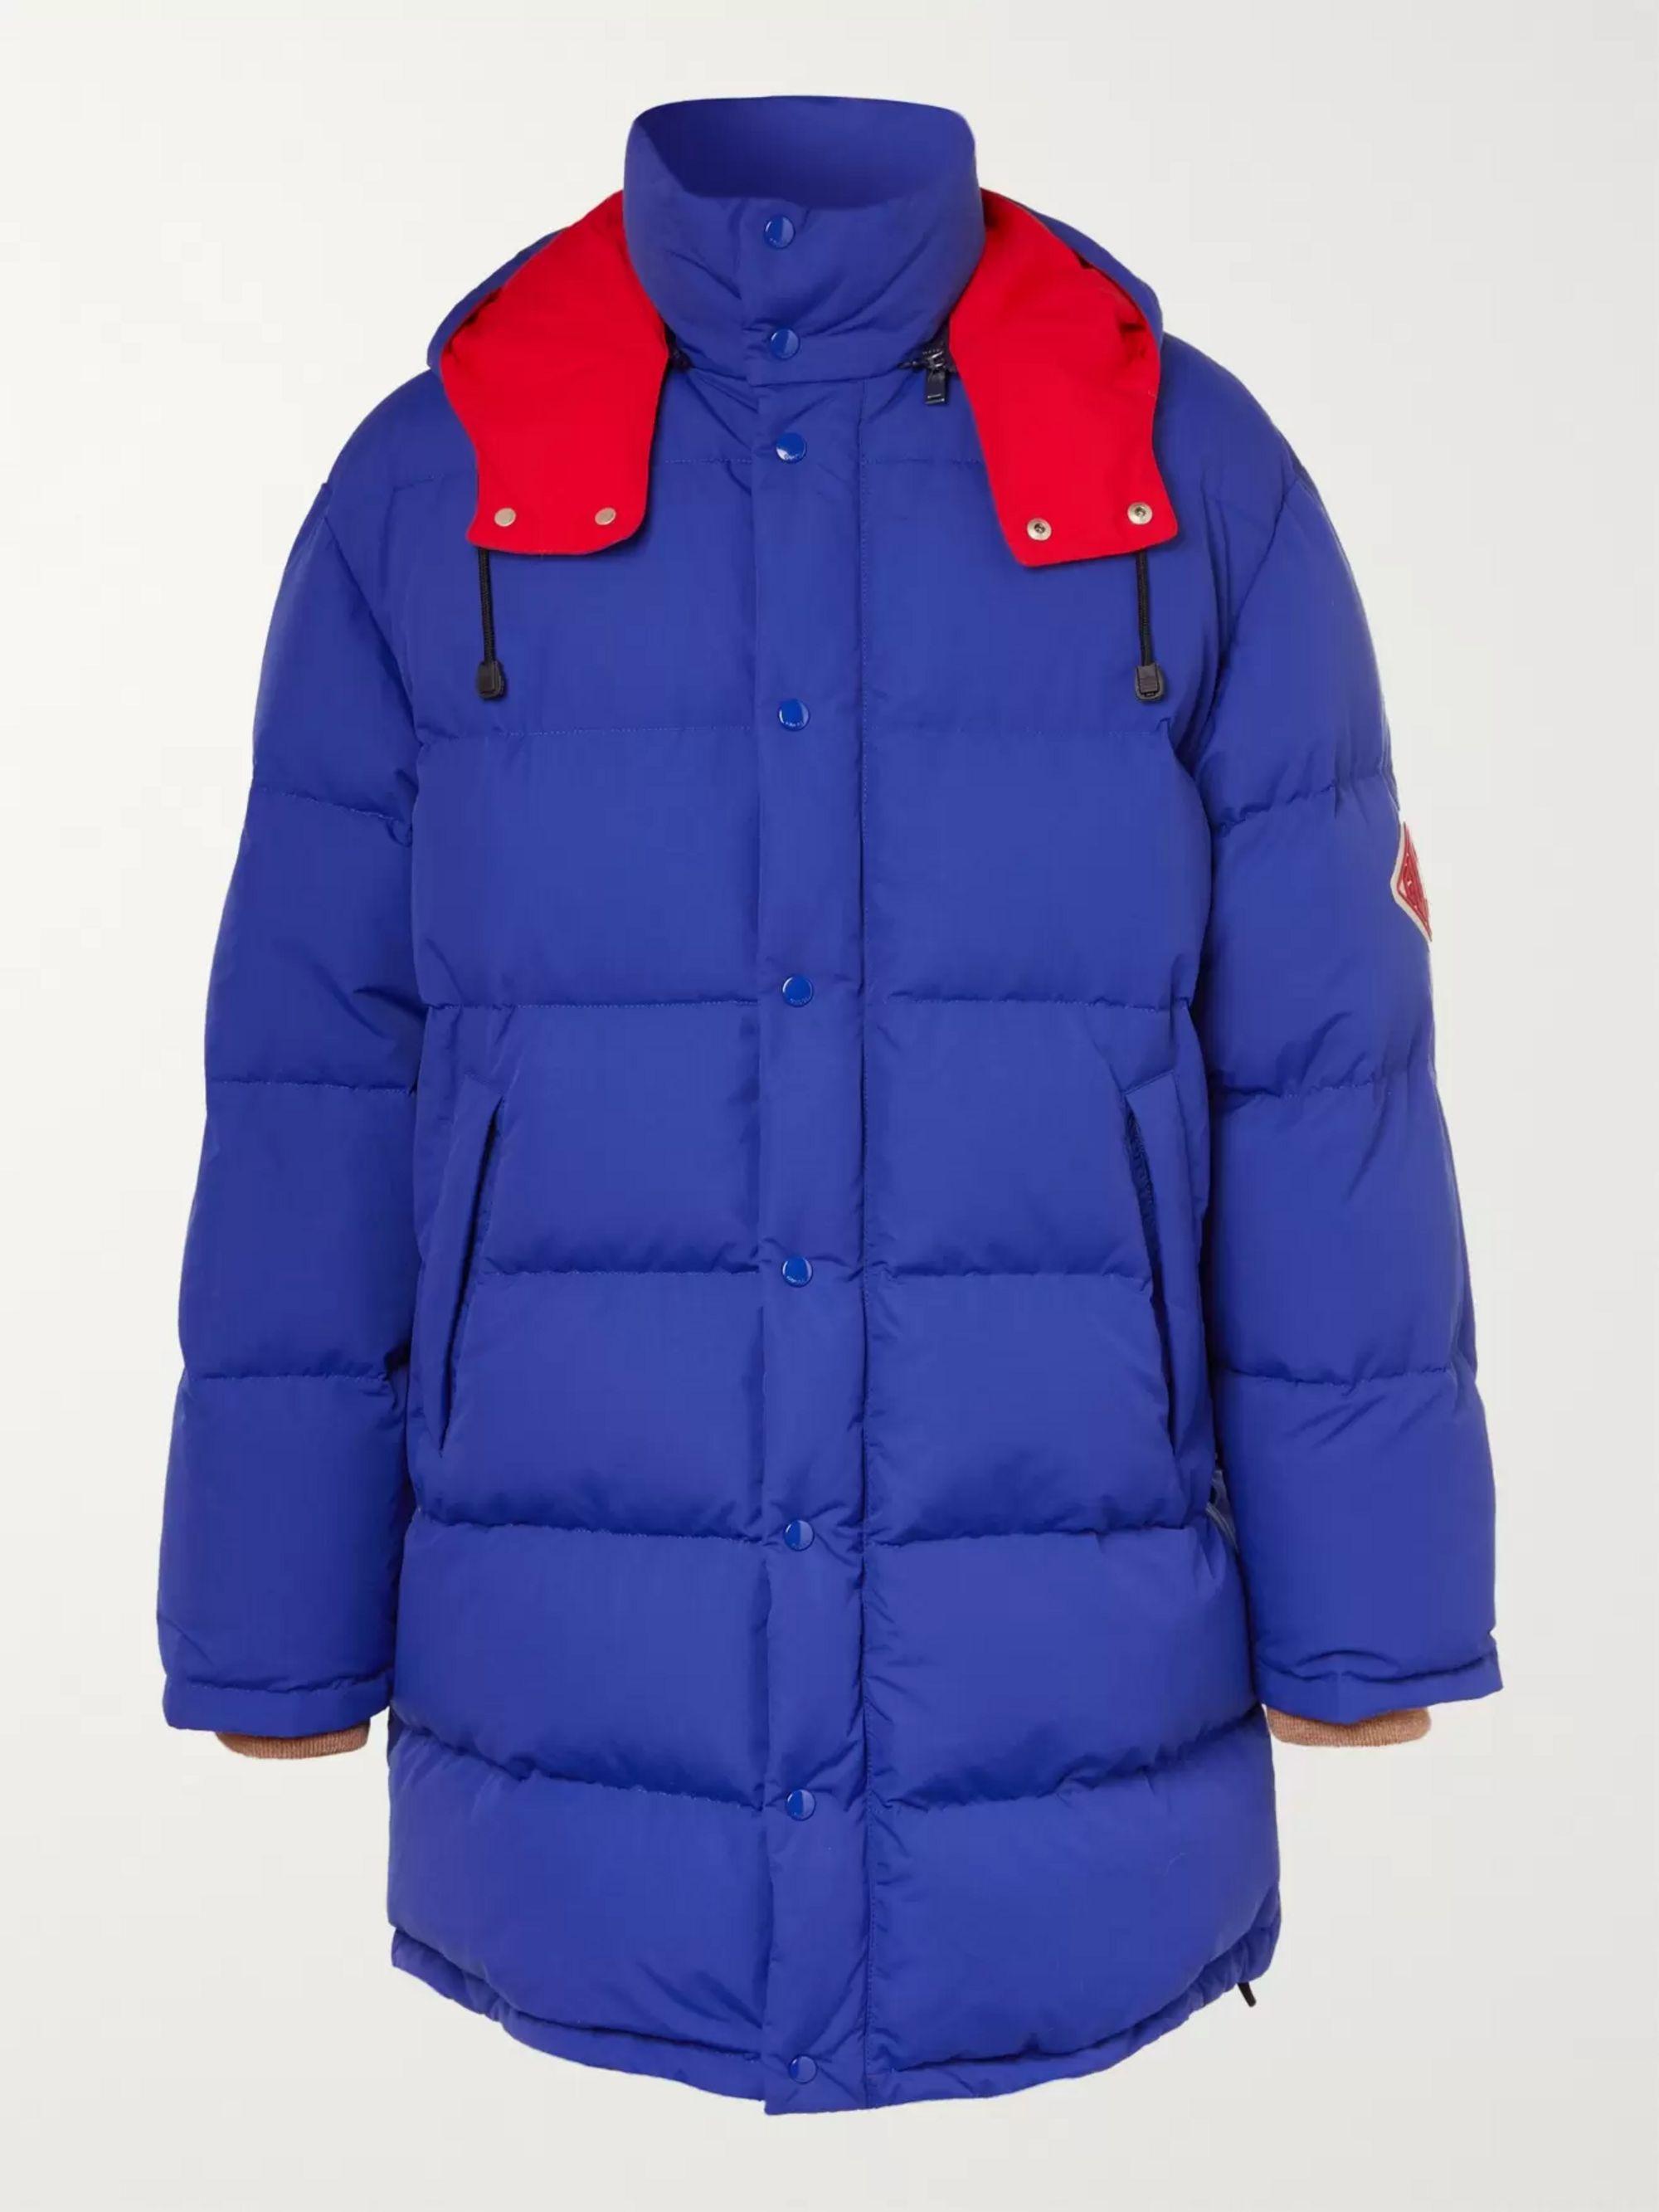 bfa1f016e Logo-Appliquéd Nylon Quilted Down Jacket